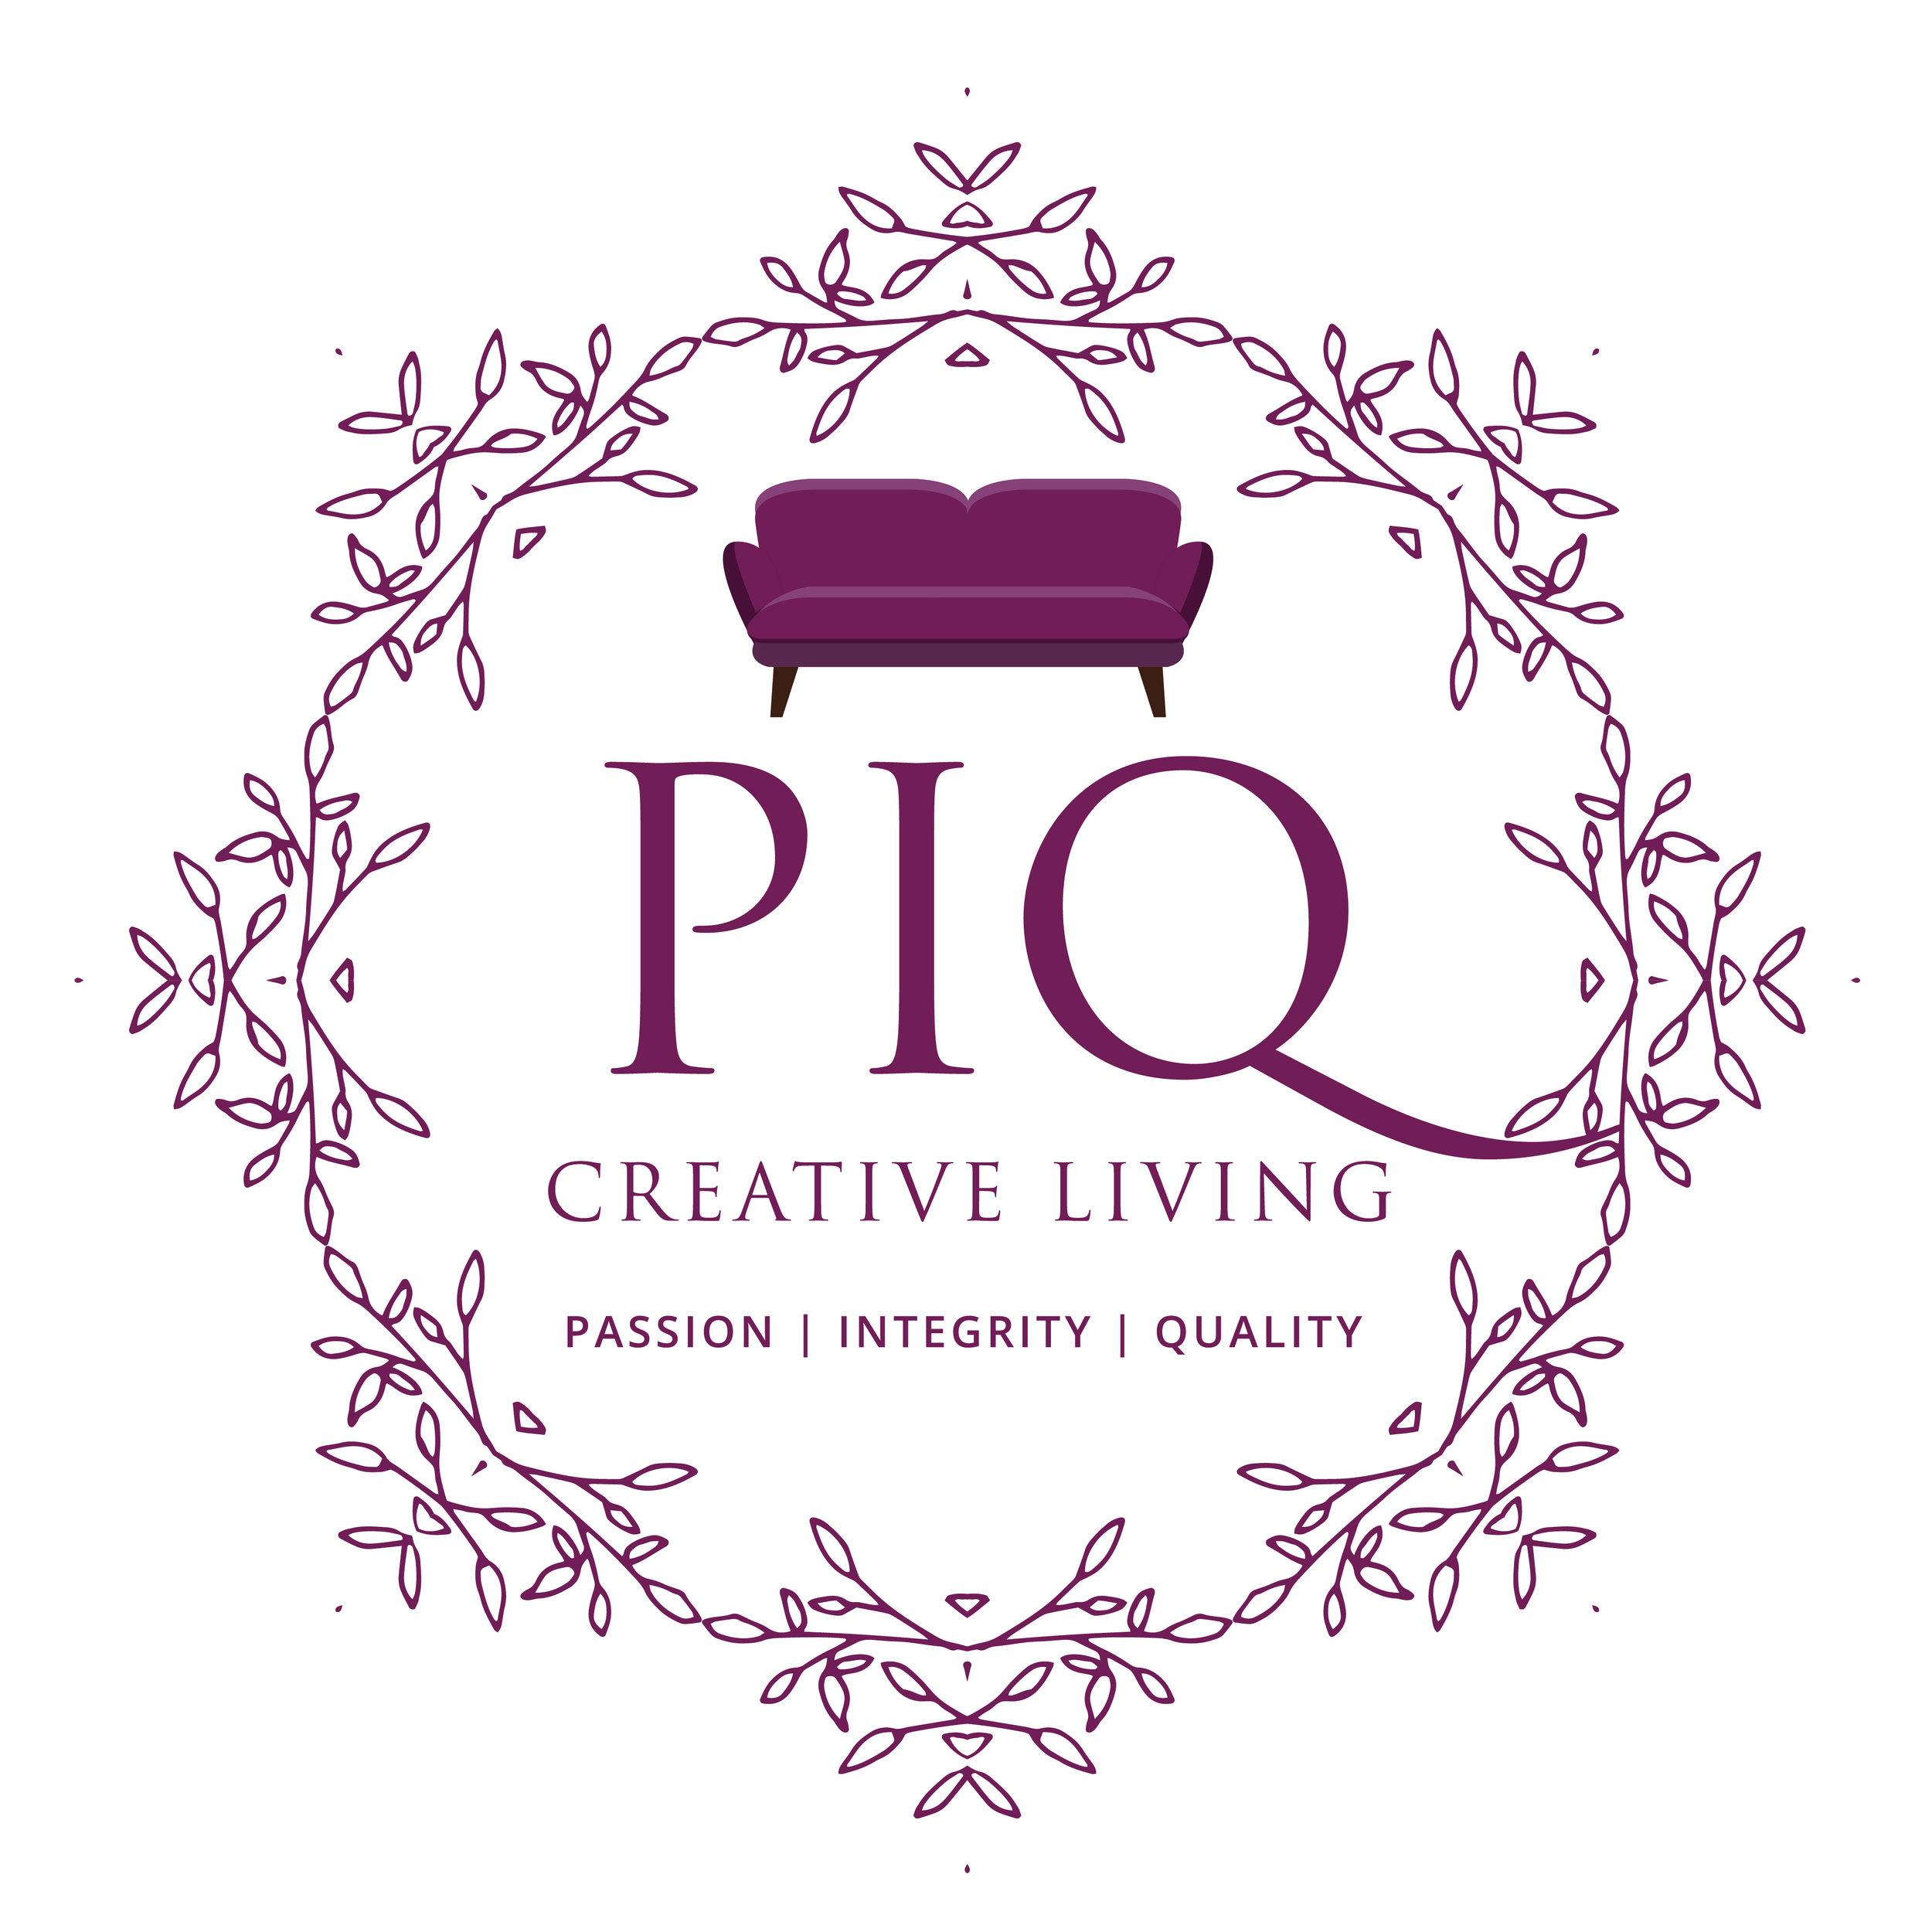 PIQ_LOGO_RGB.jpg